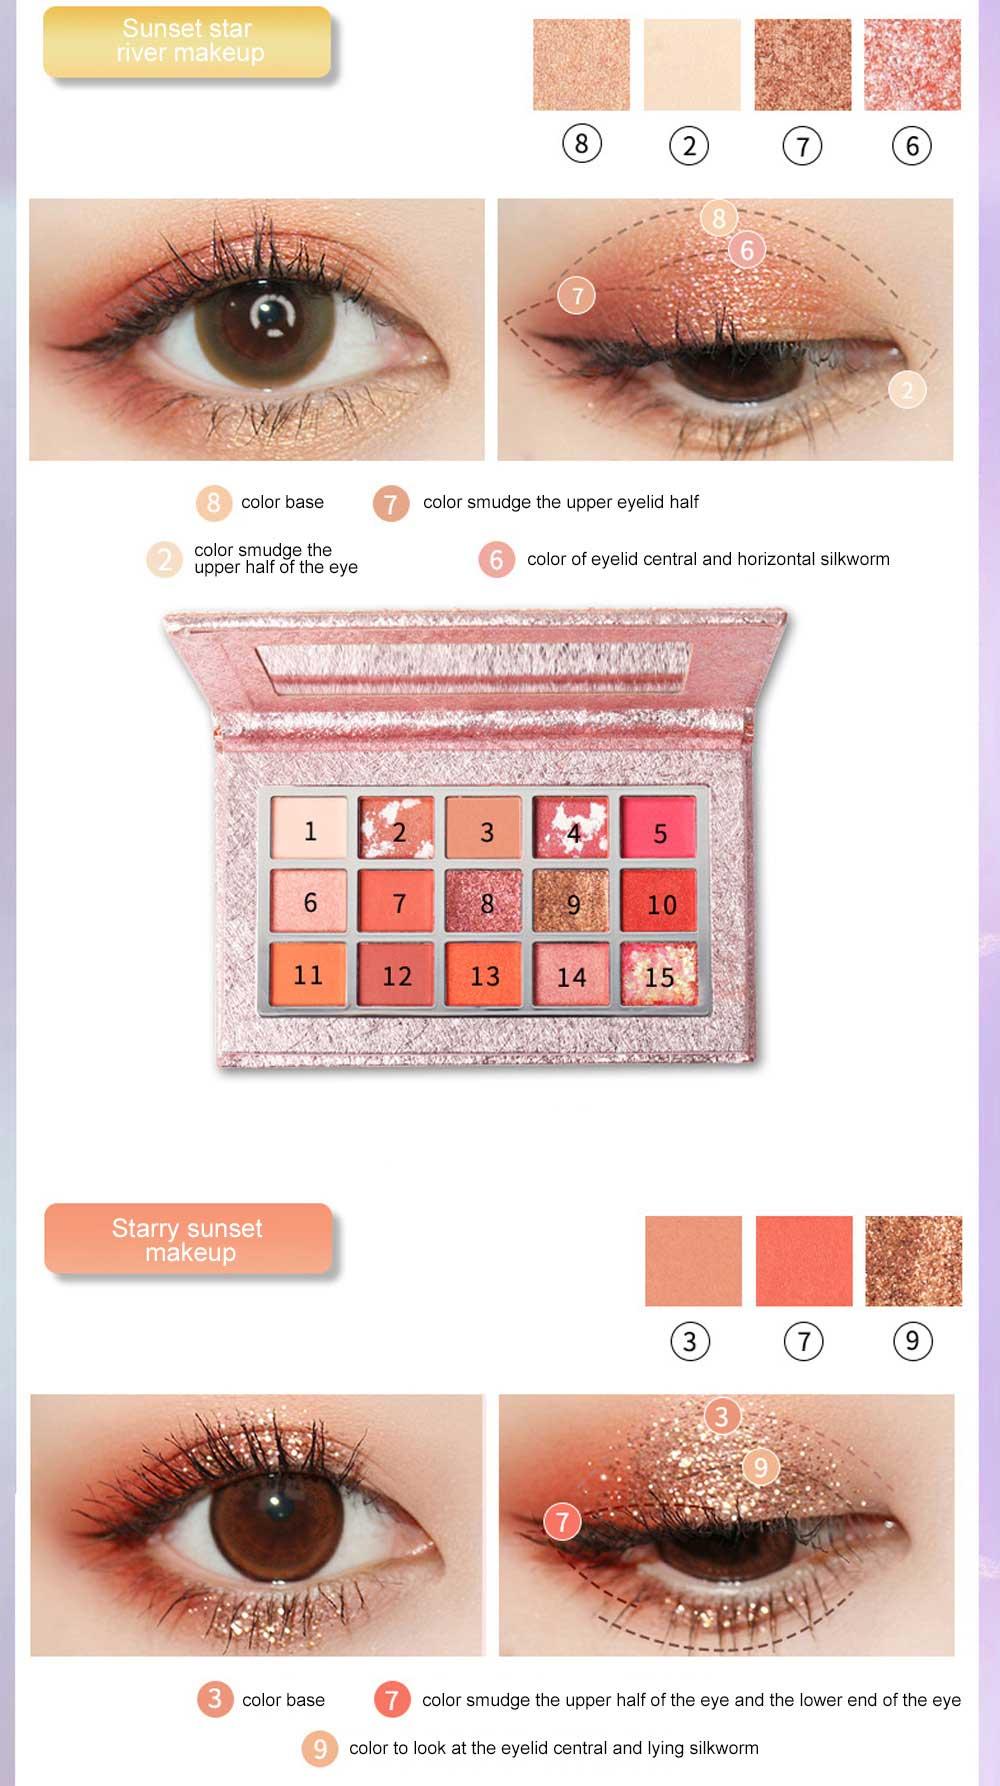 Cosmetics Makeup 15 Color Glitter Eyeshadow Waterproof Easy Clean Palette Eye Shadow Make Up Palettes 6